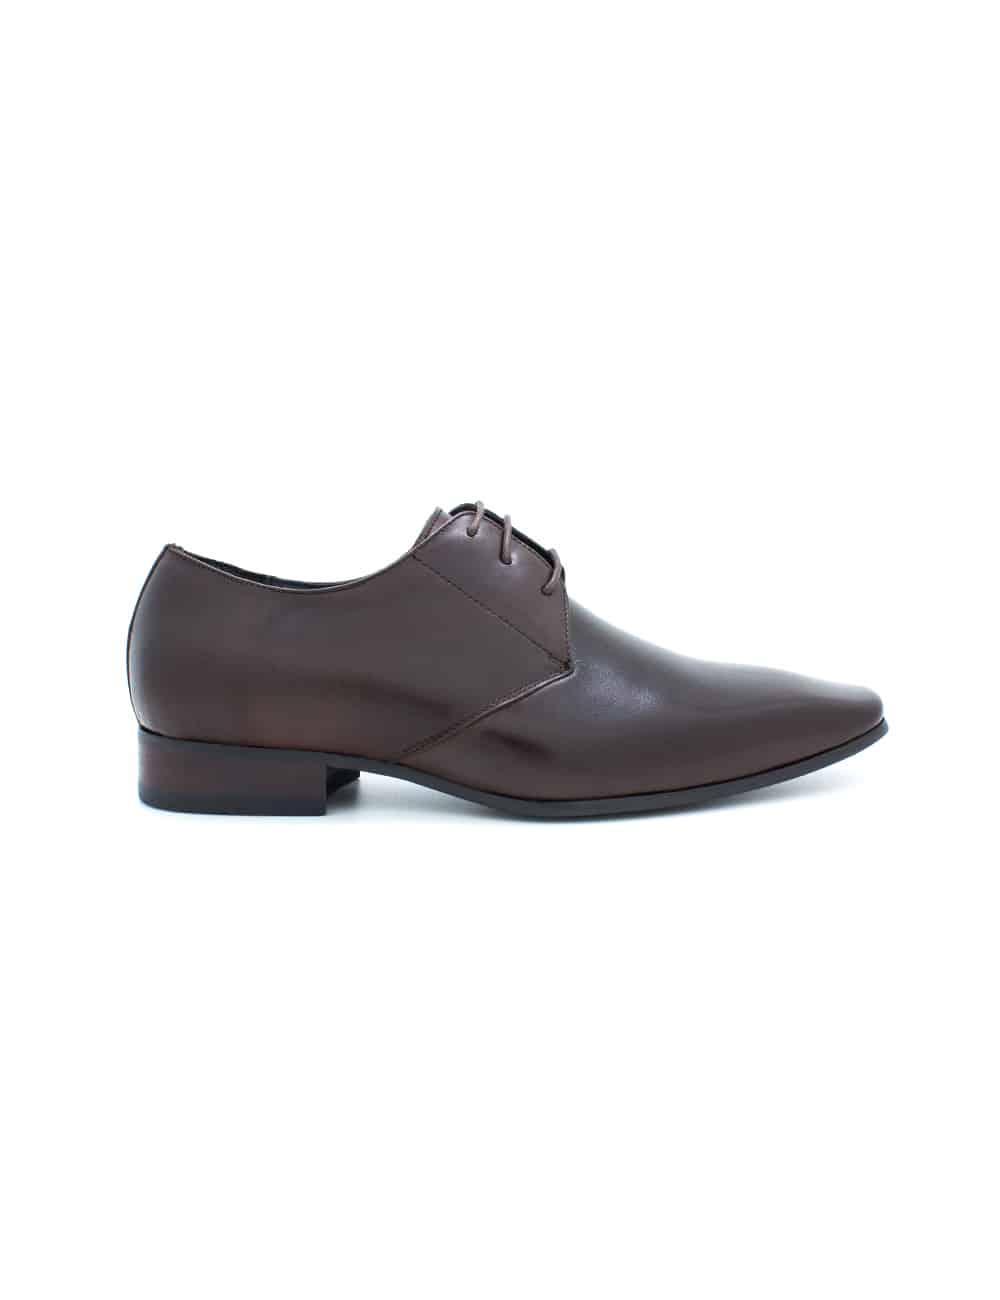 Dark Brown Leather Oxford Plain Toe F12A21.2